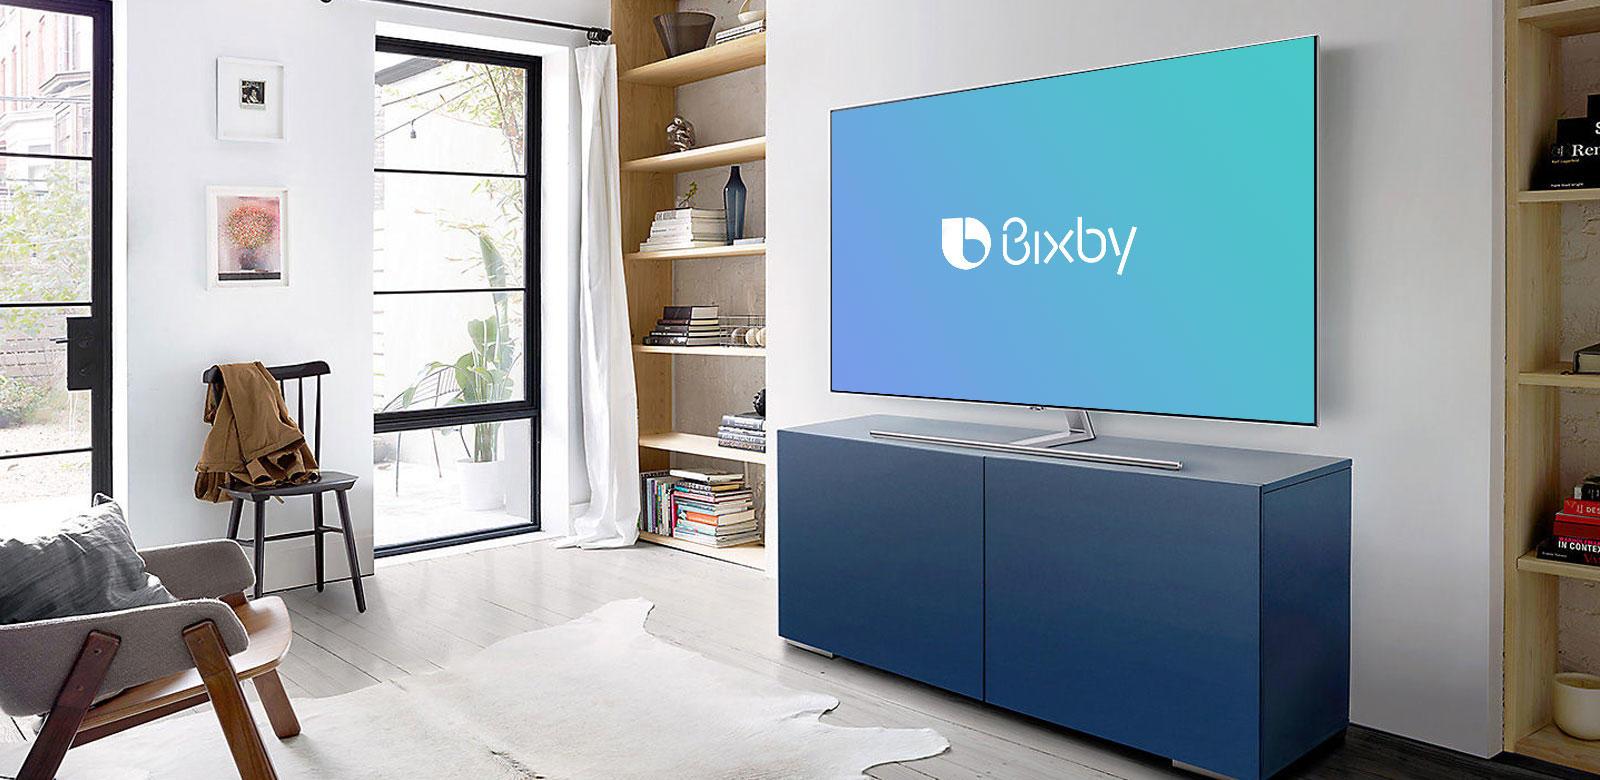 Samsung QLED Smart TVs & Bixby Assistant